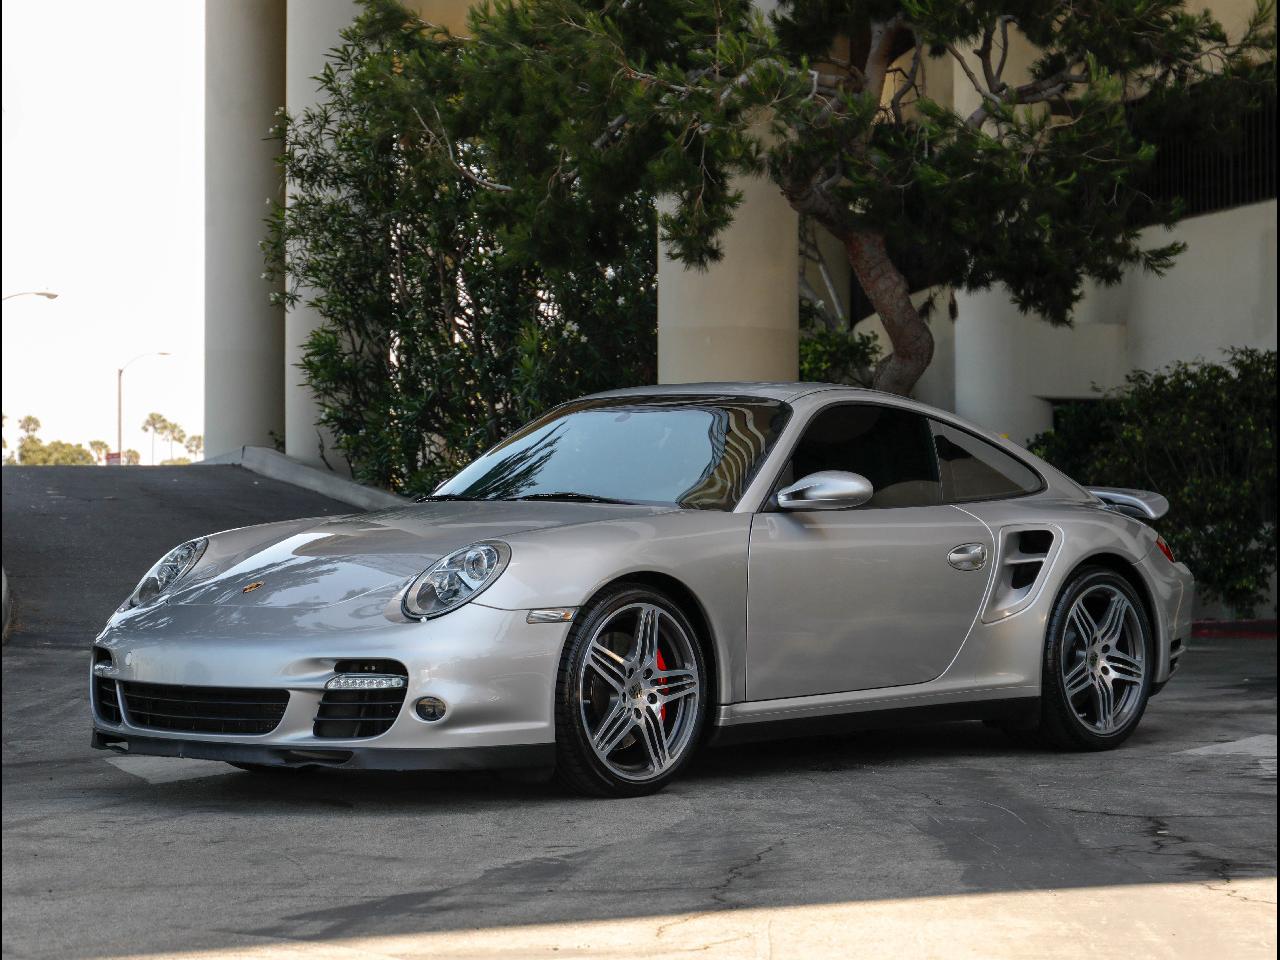 2007 Porsche 911 Turbo 997.1 Turbo Coupe